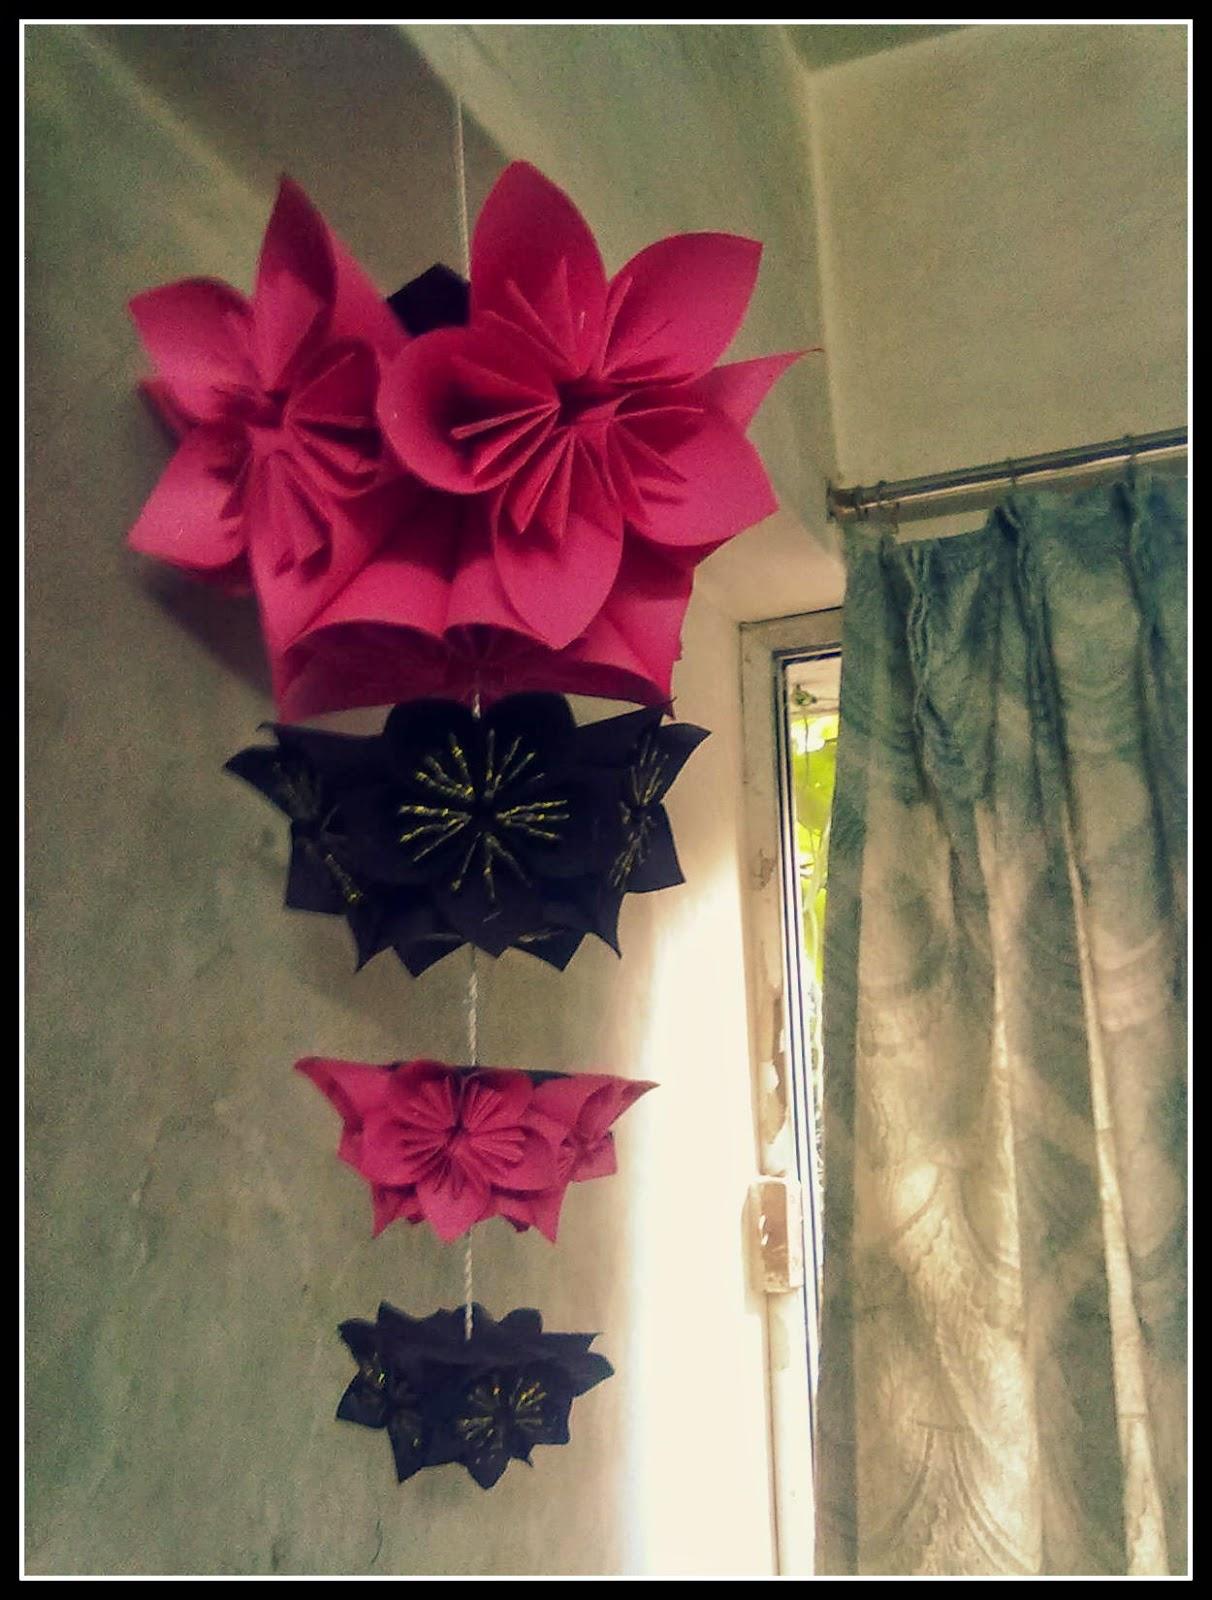 My creativity origami flower hanging origami flower hanging mightylinksfo